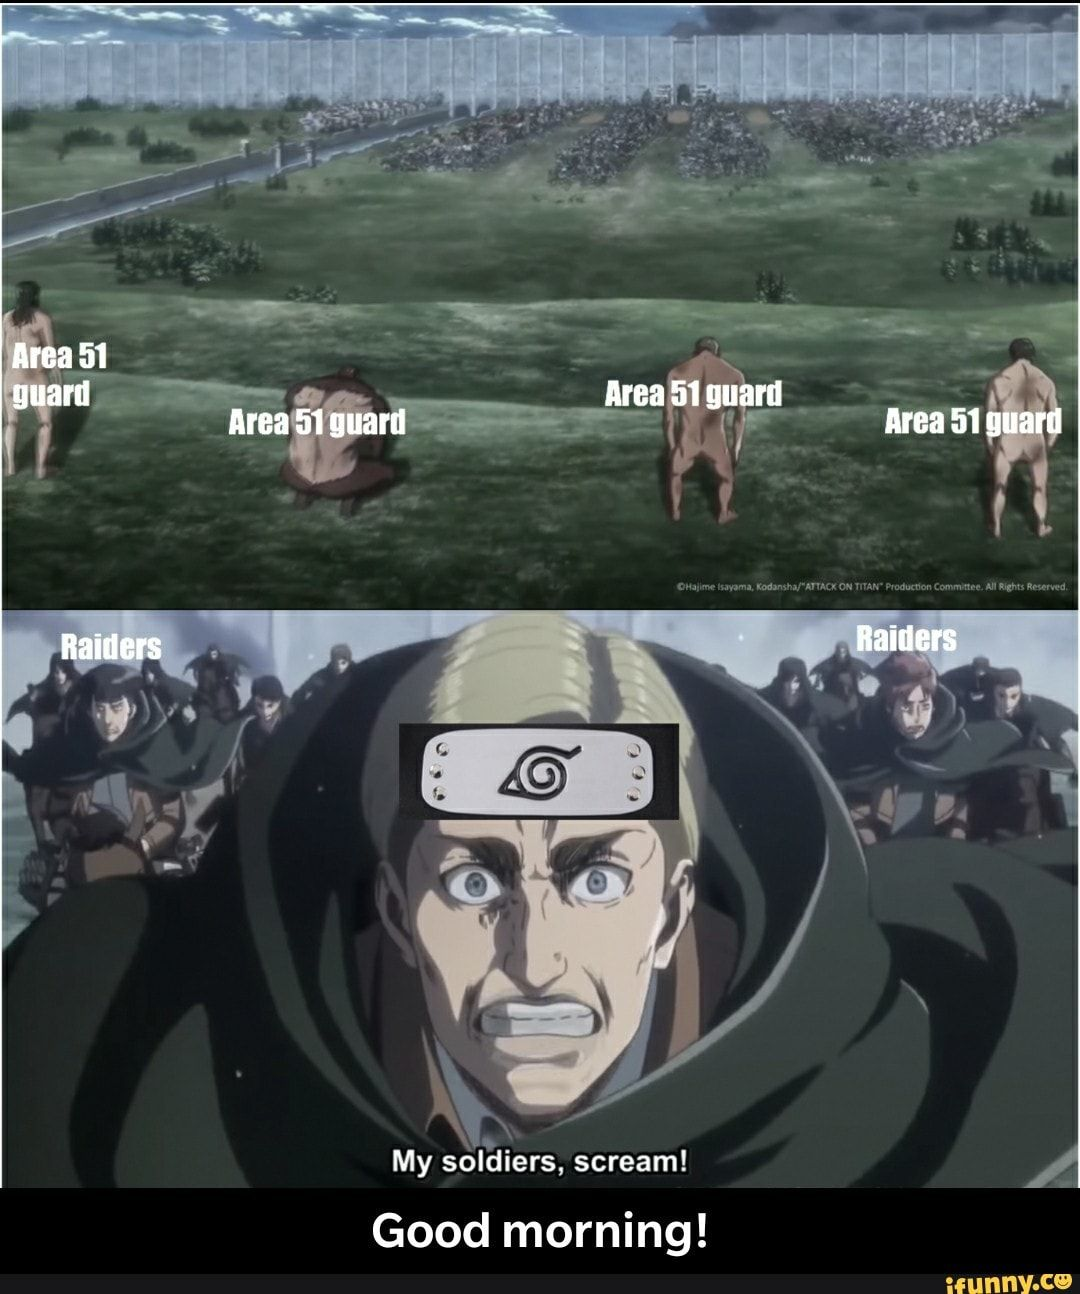 Meme memes bgews2s27: 1 comment — iFunny